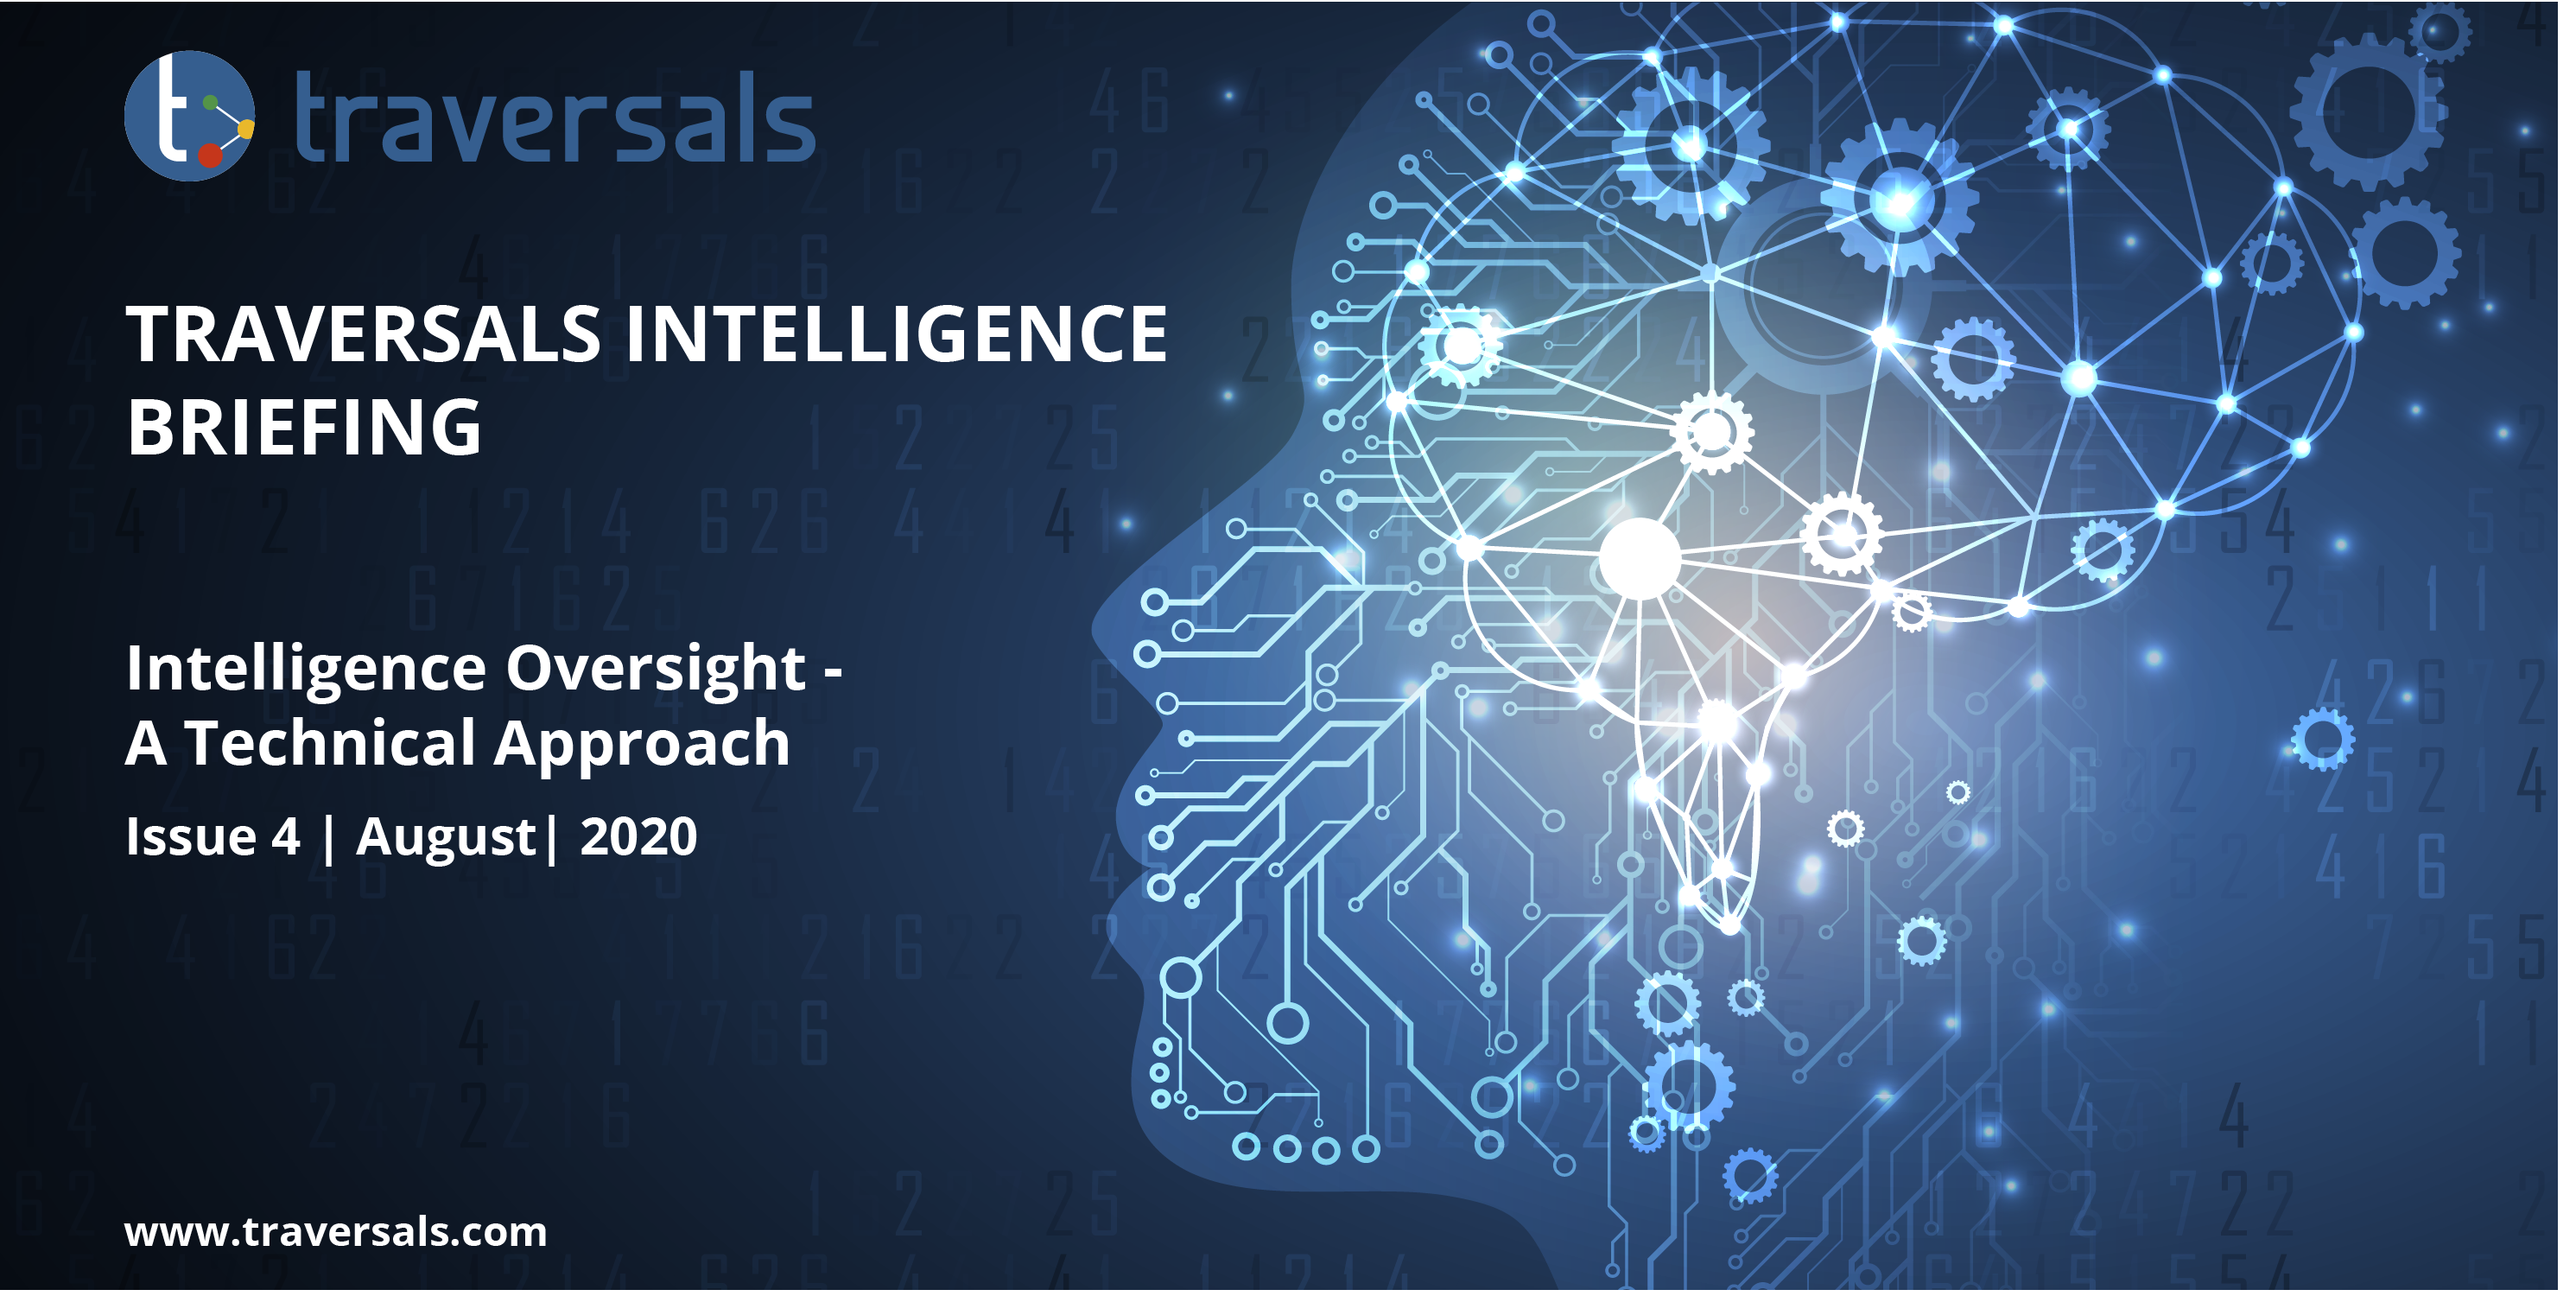 Intelligence Oversight - A Technical Approach